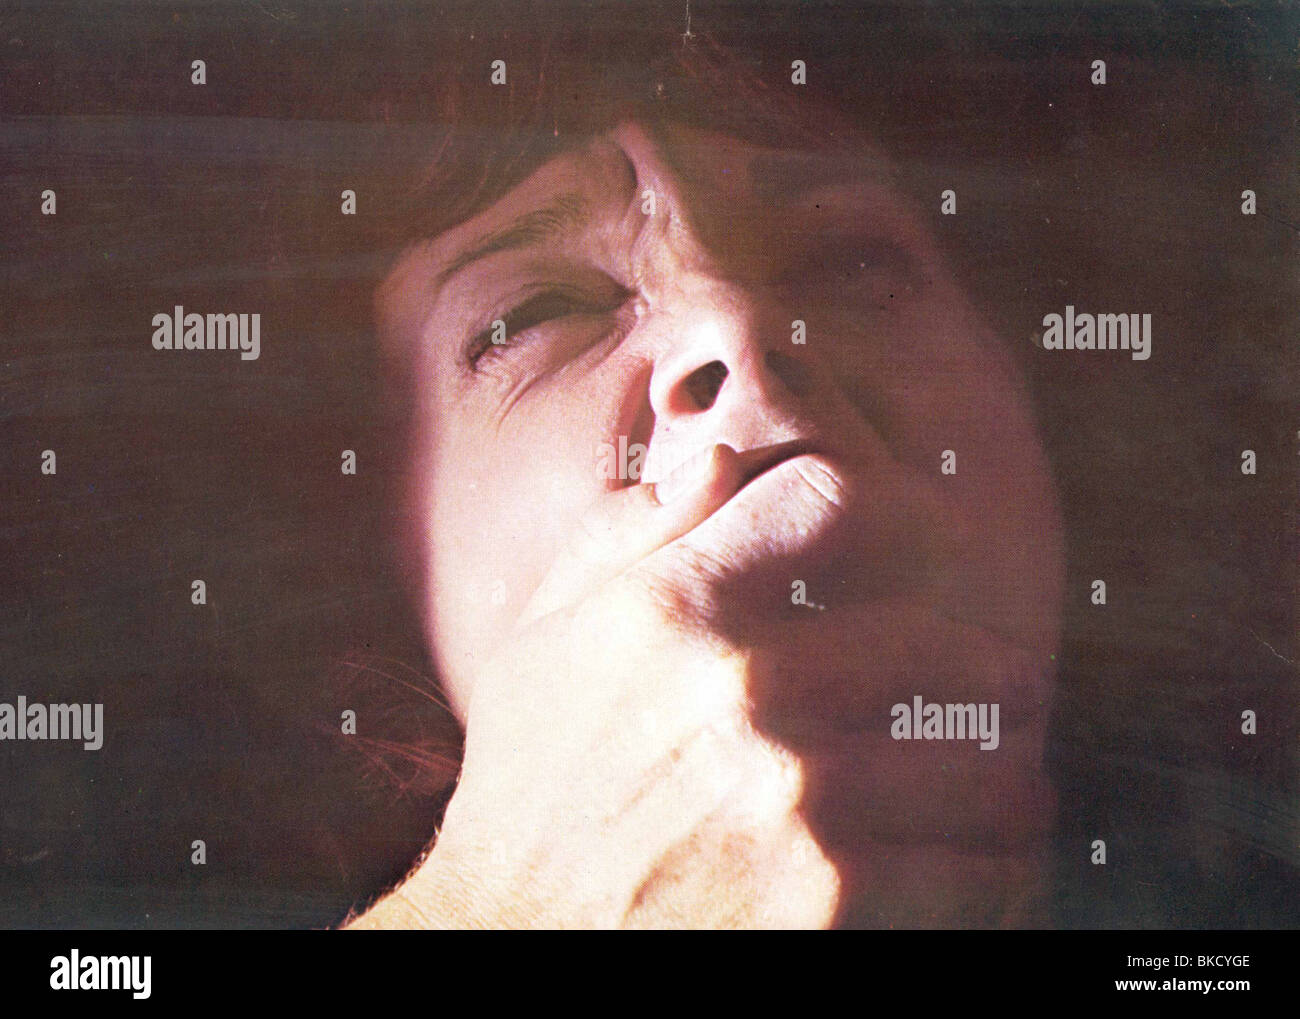 FRENZY -1972 ANNA MASSEY - Stock Image